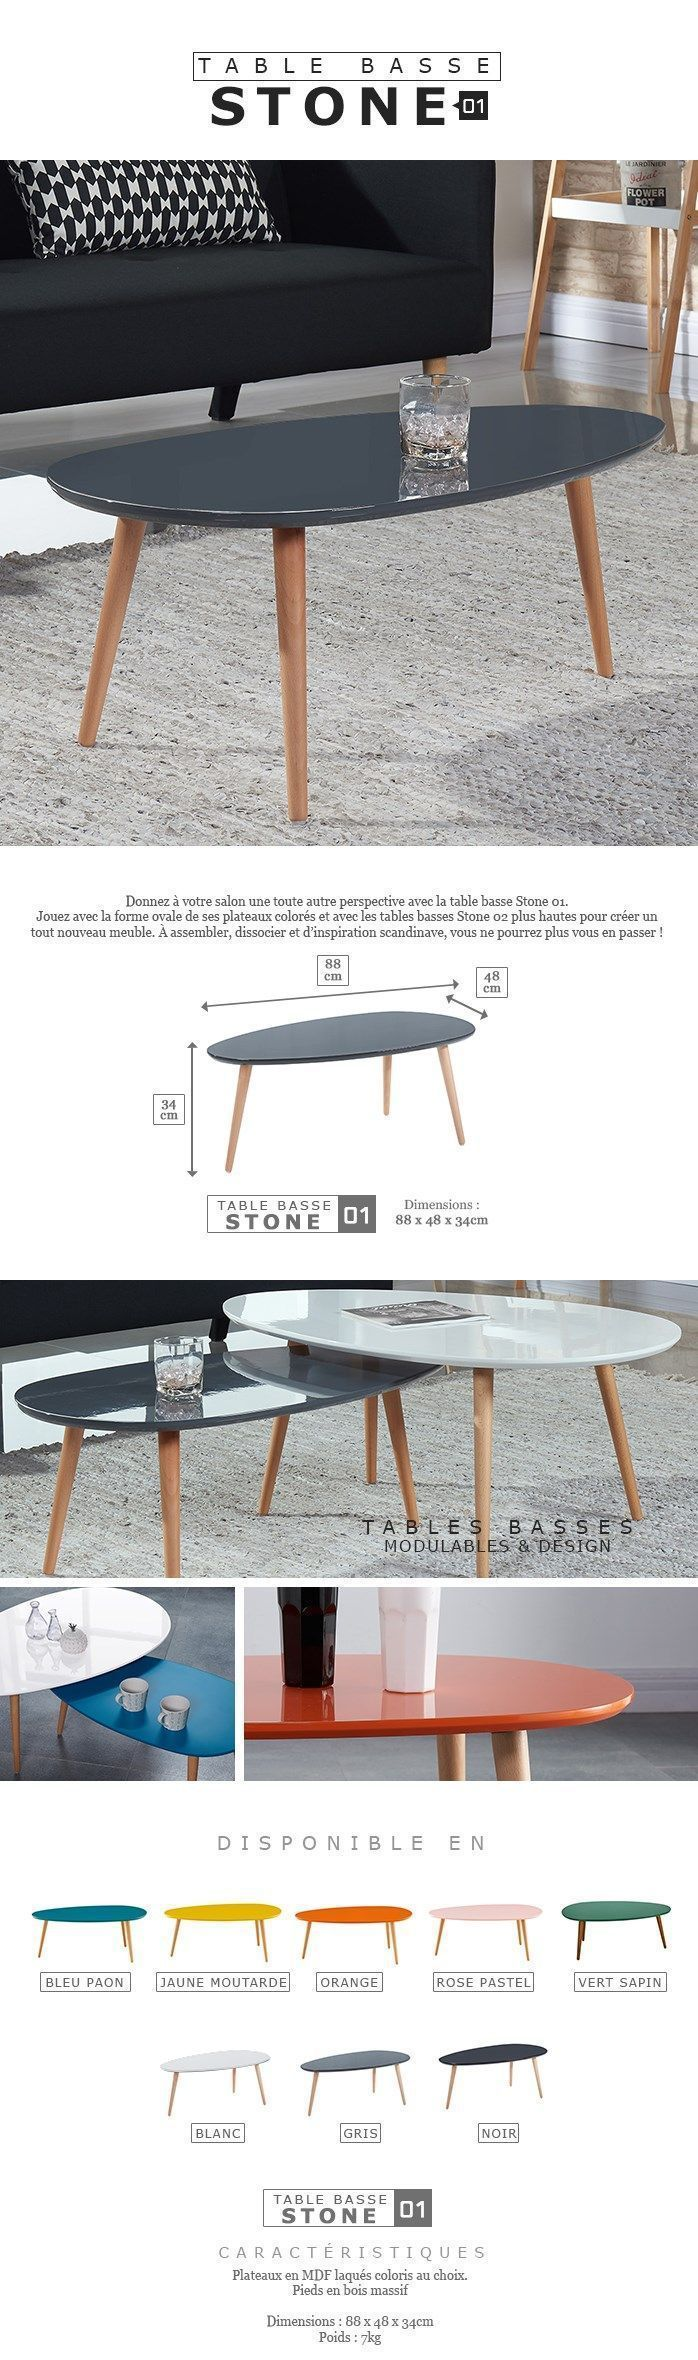 stone table basse scandinave laqu e jaune moutarde satin l 88 x l 48 cm achat vente table. Black Bedroom Furniture Sets. Home Design Ideas